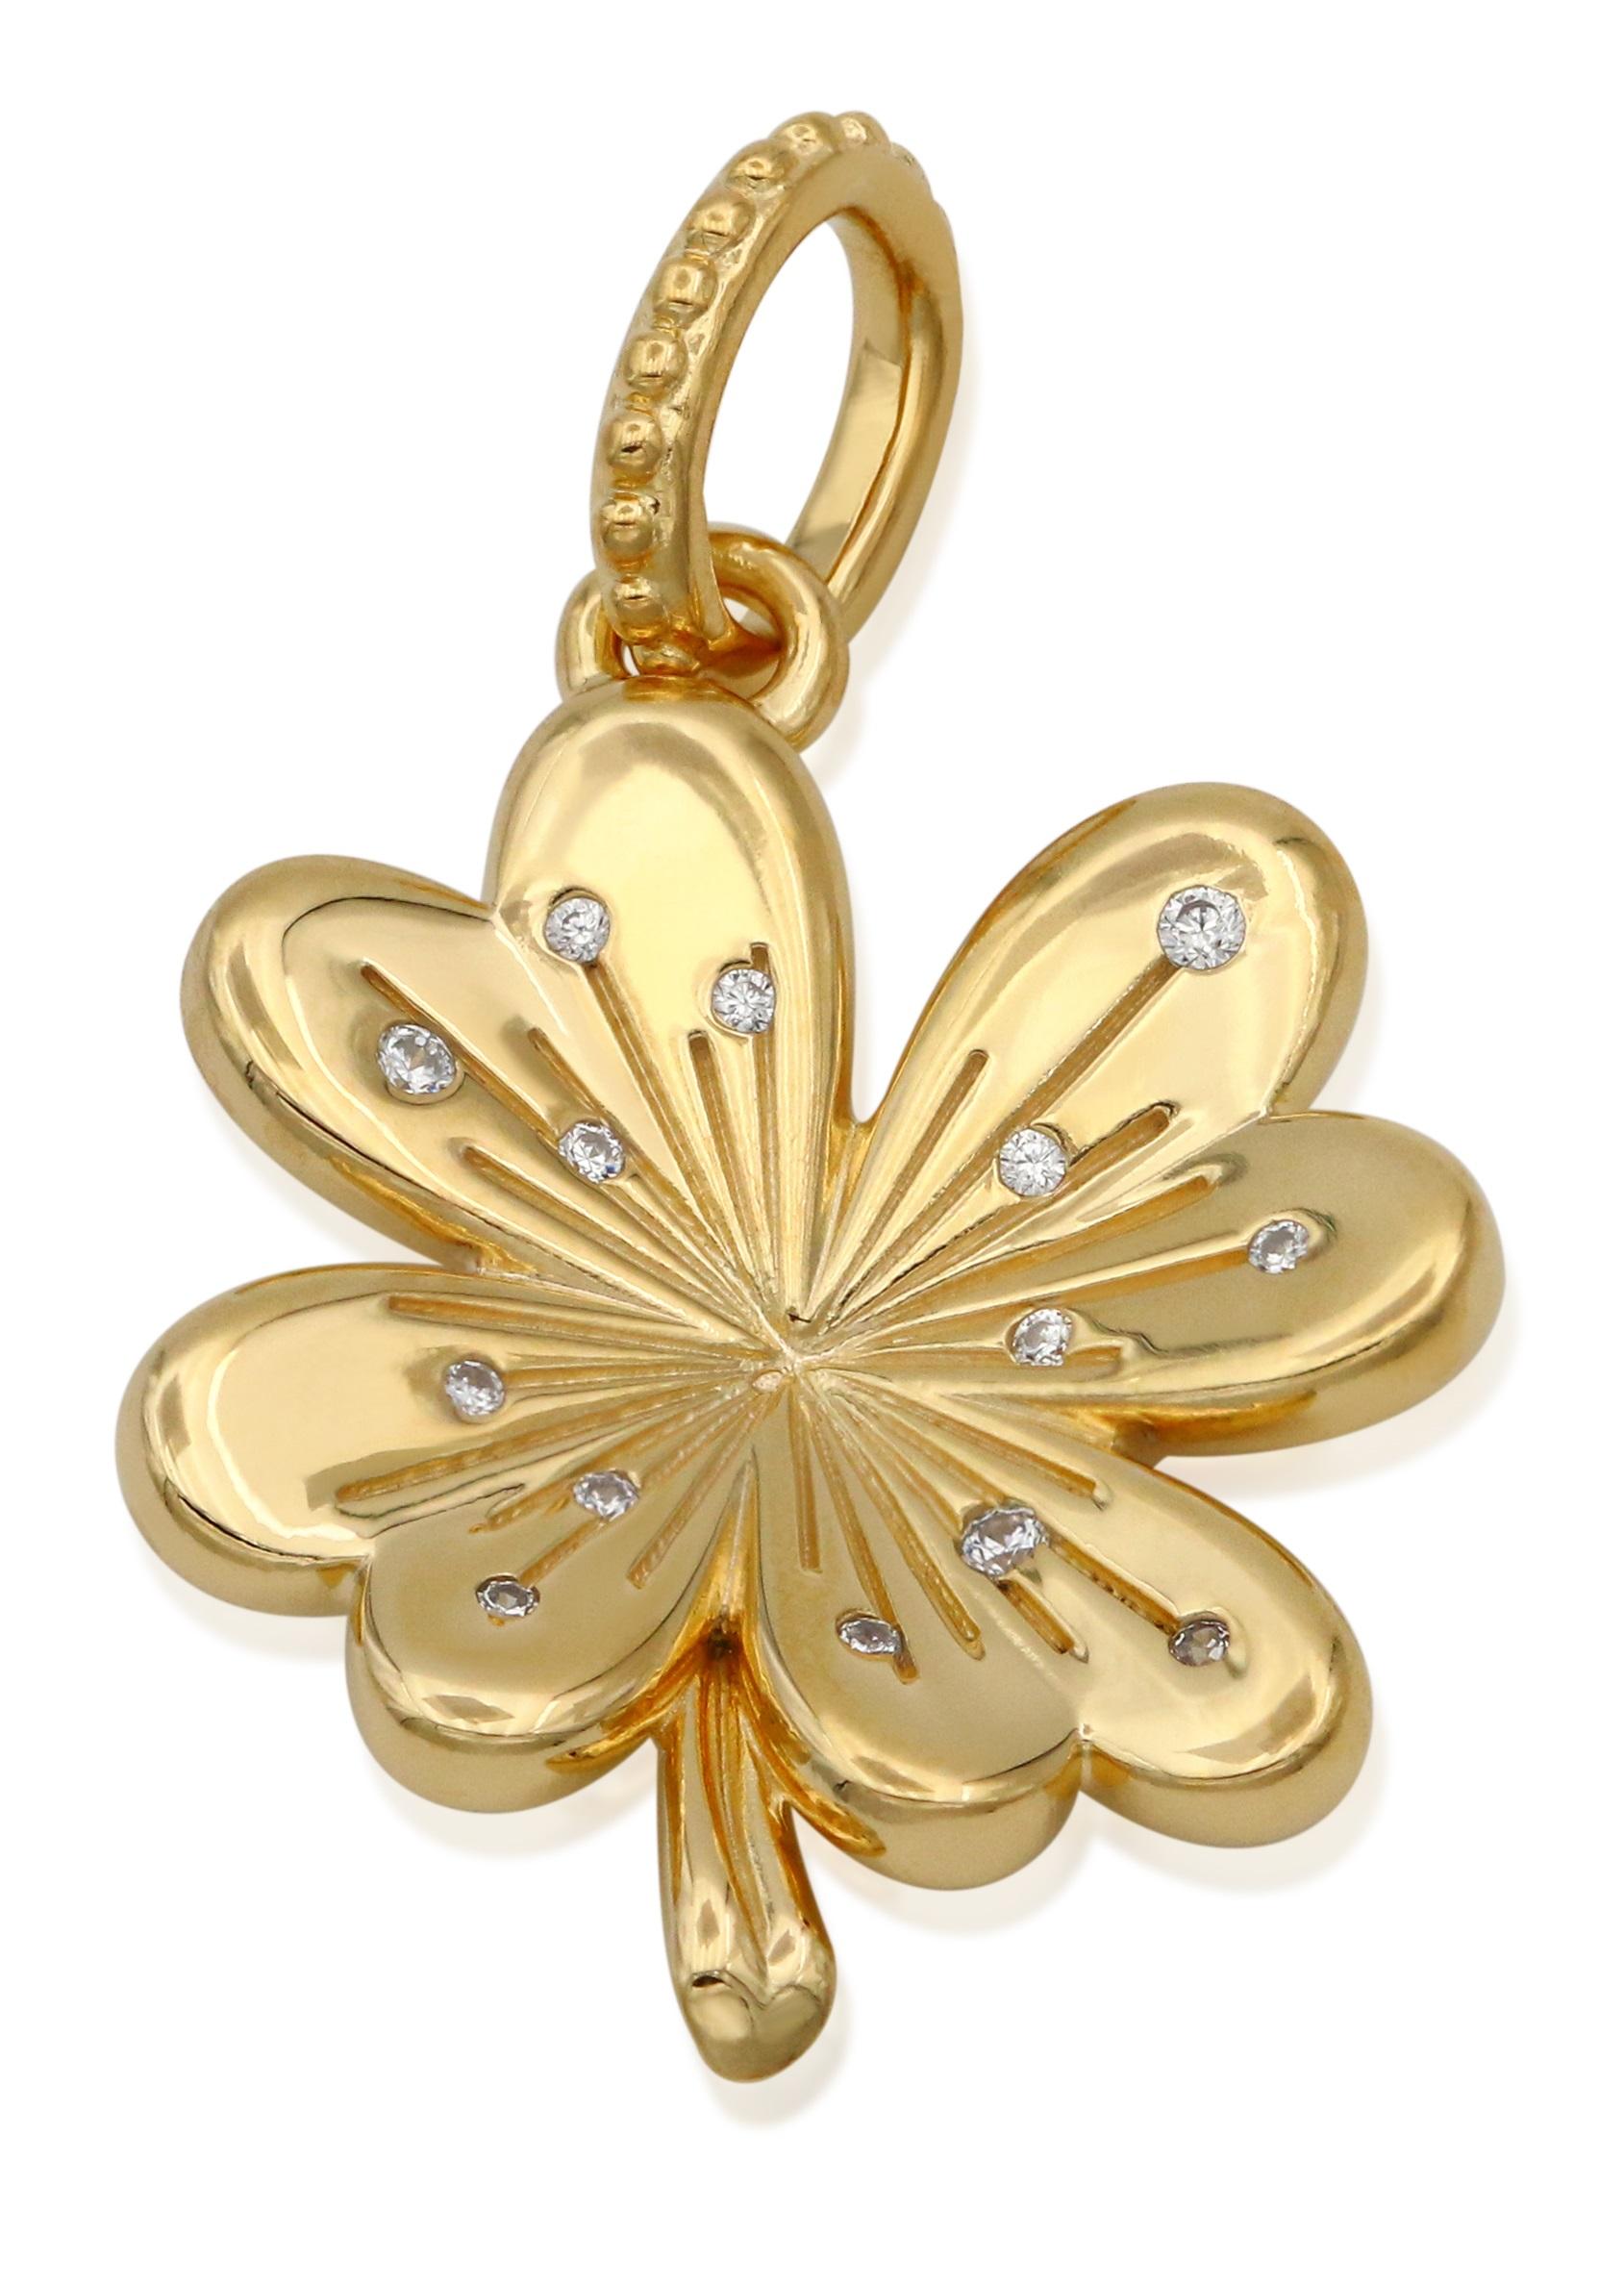 Details about PANDORA Lucky Four-Leaf Clover Pendant